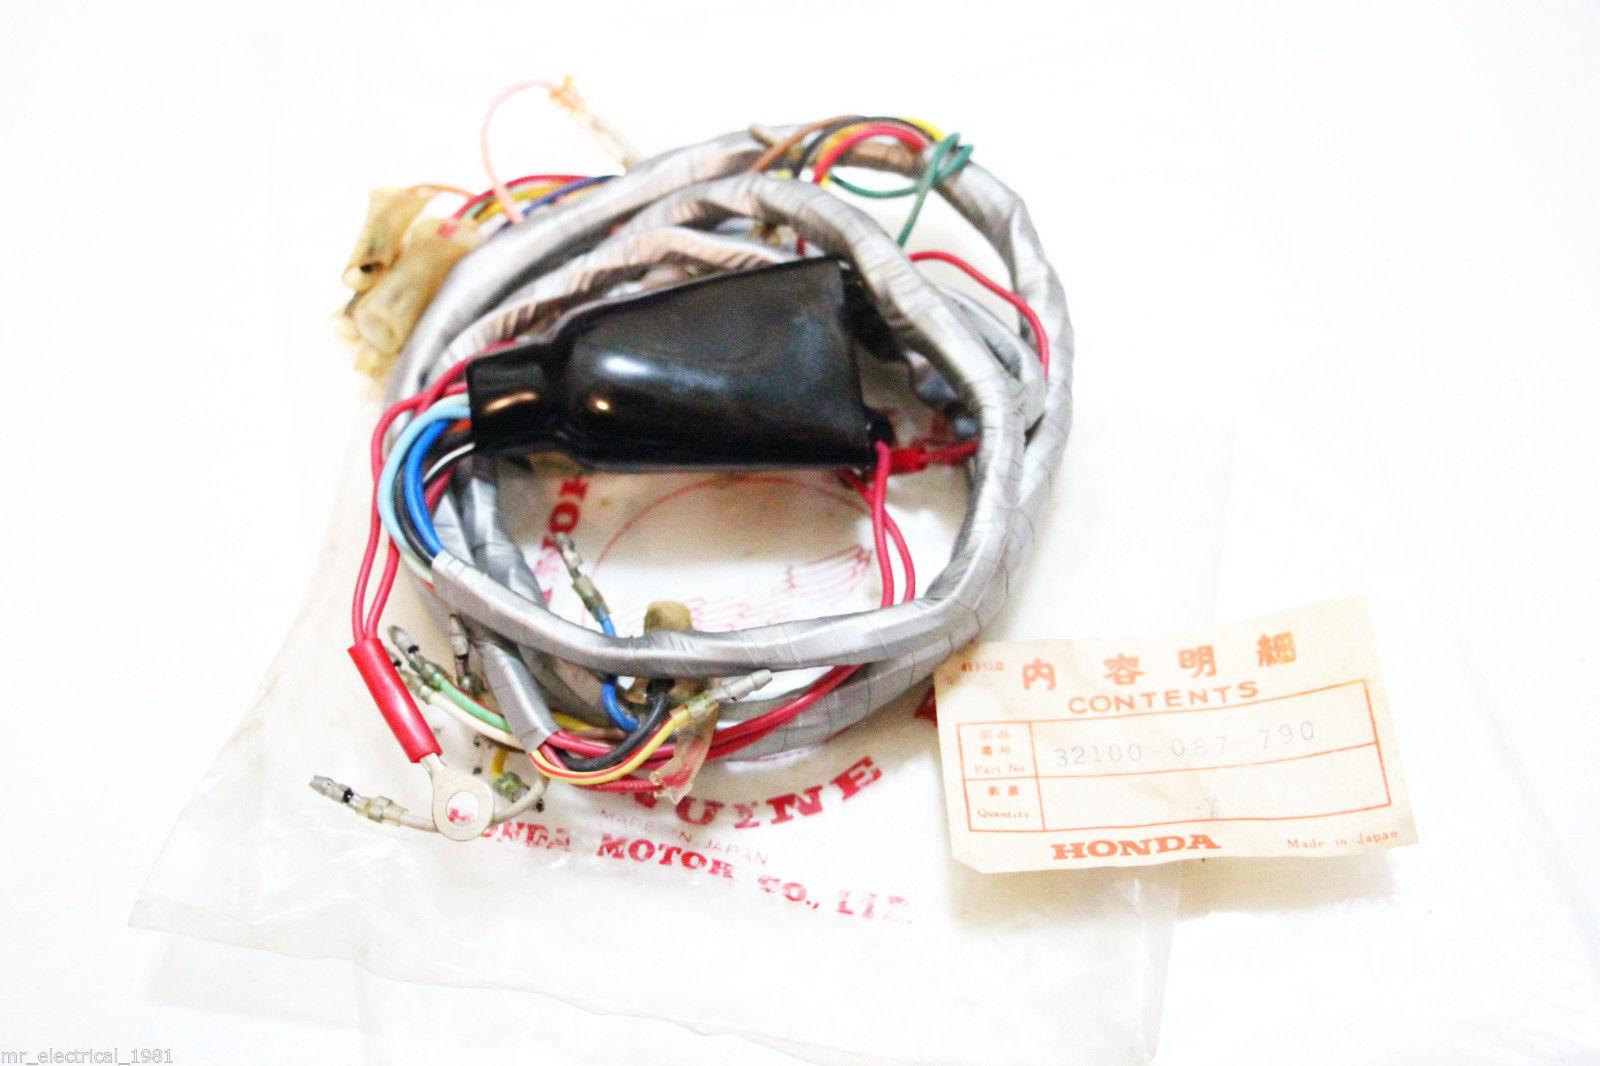 honda s90 wiring harness honda c70 c70m wiring wire harness nos and 38 similar items  honda c70 c70m wiring wire harness nos